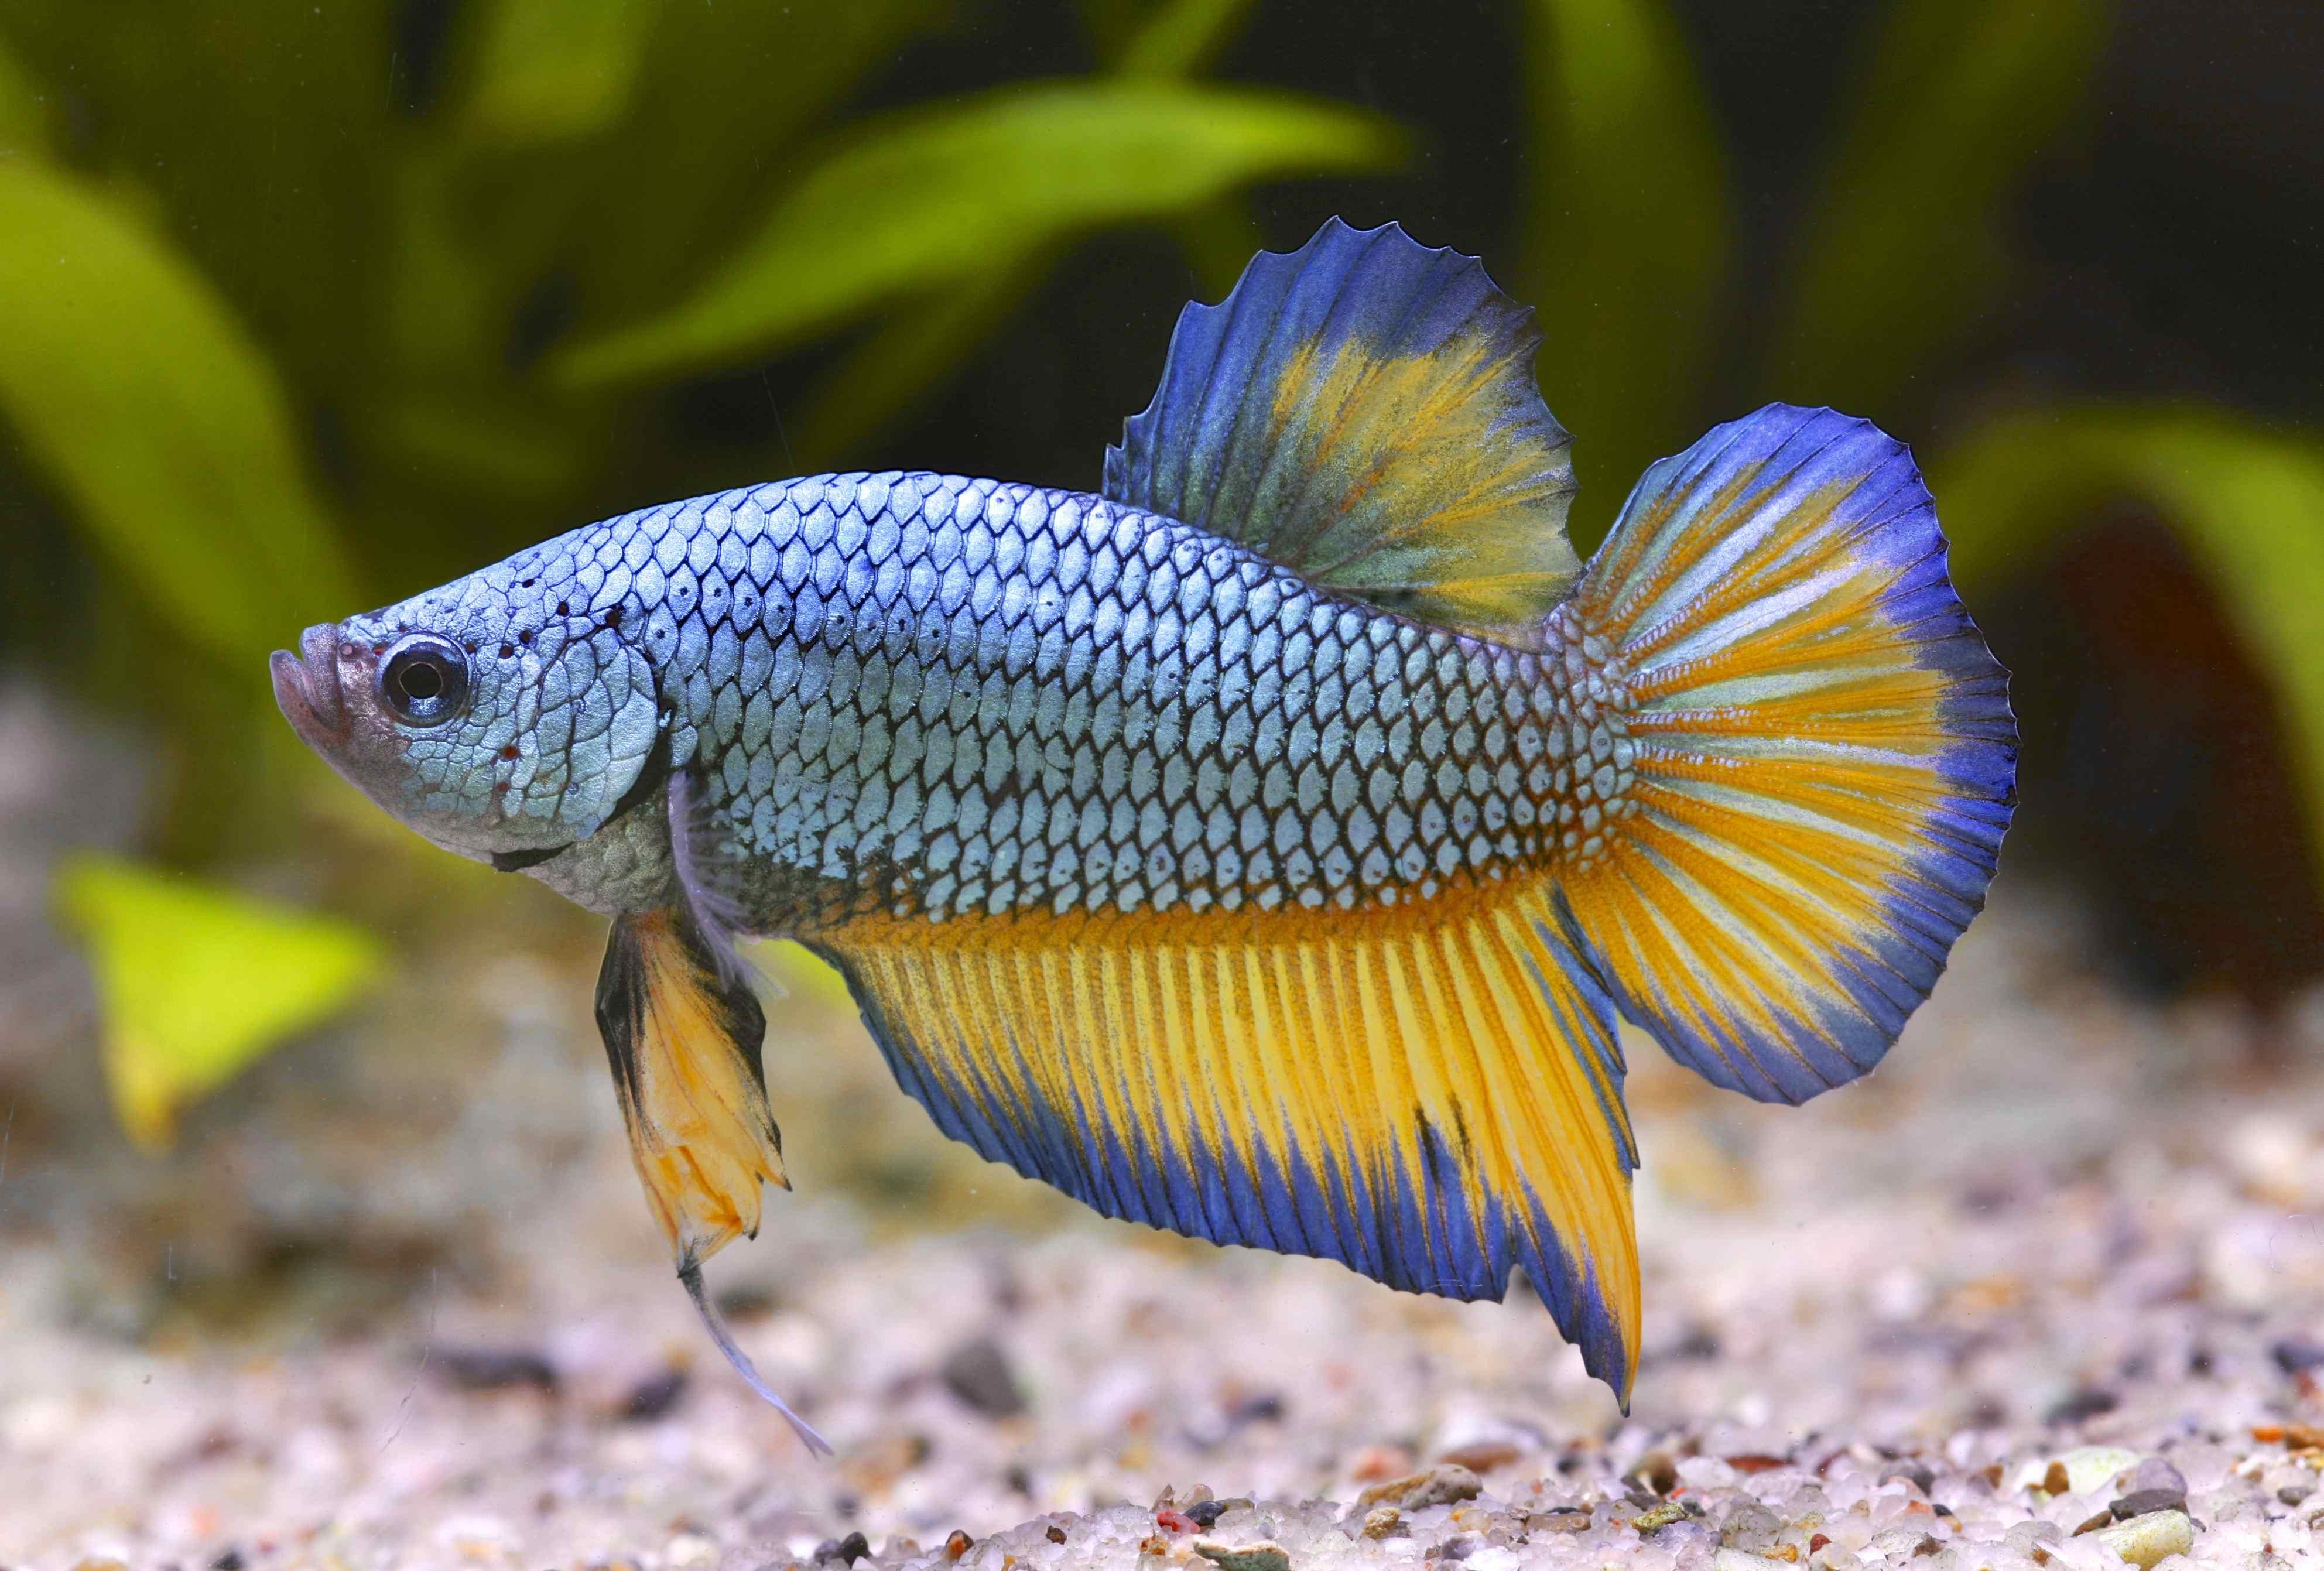 Cl10 zierfisch zentrum zierfisch zentrum for Zierfische aquarium